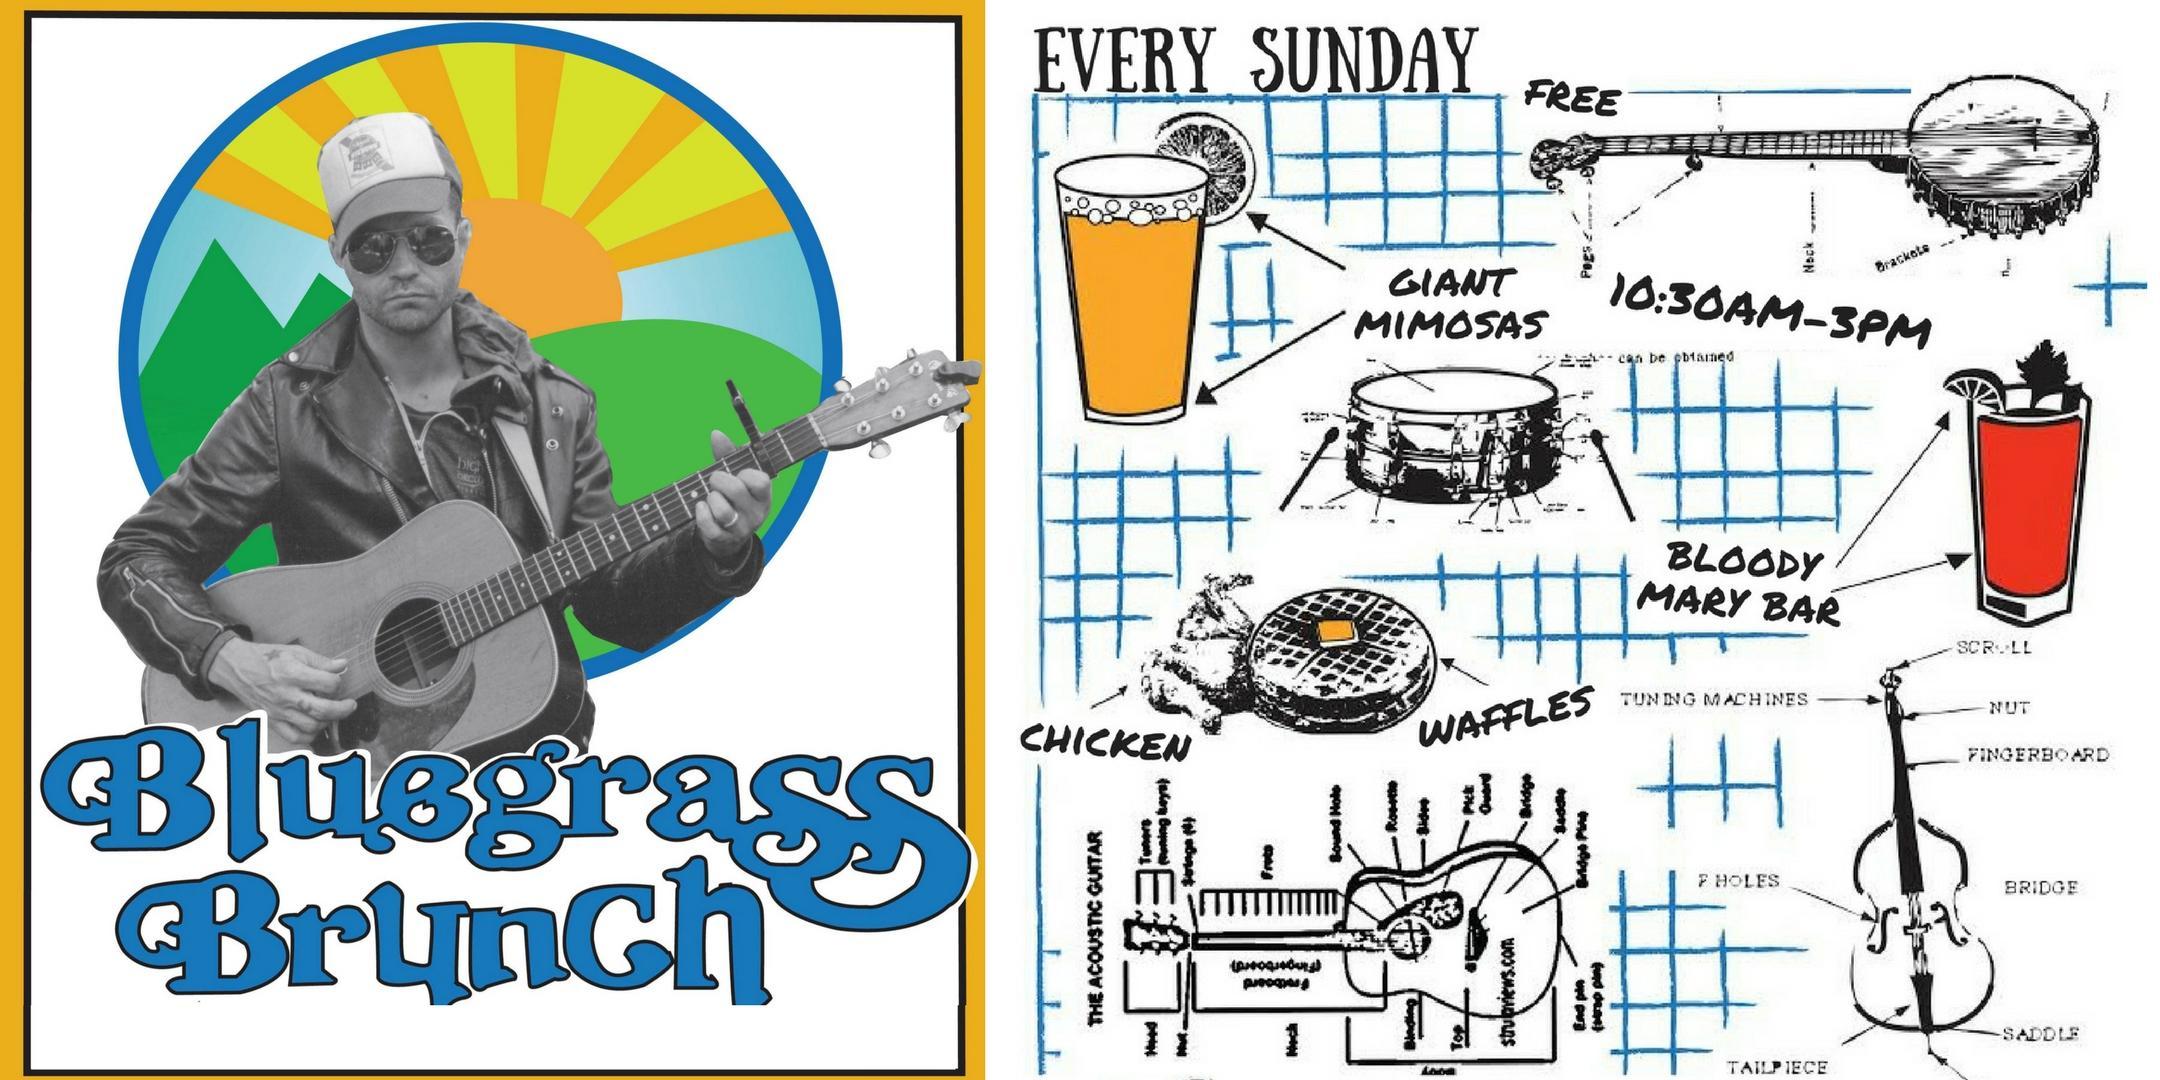 Bluegrass Brunch w/ Sufi Brothers, Bald Mountain Boys + Chicken Coop Willaye